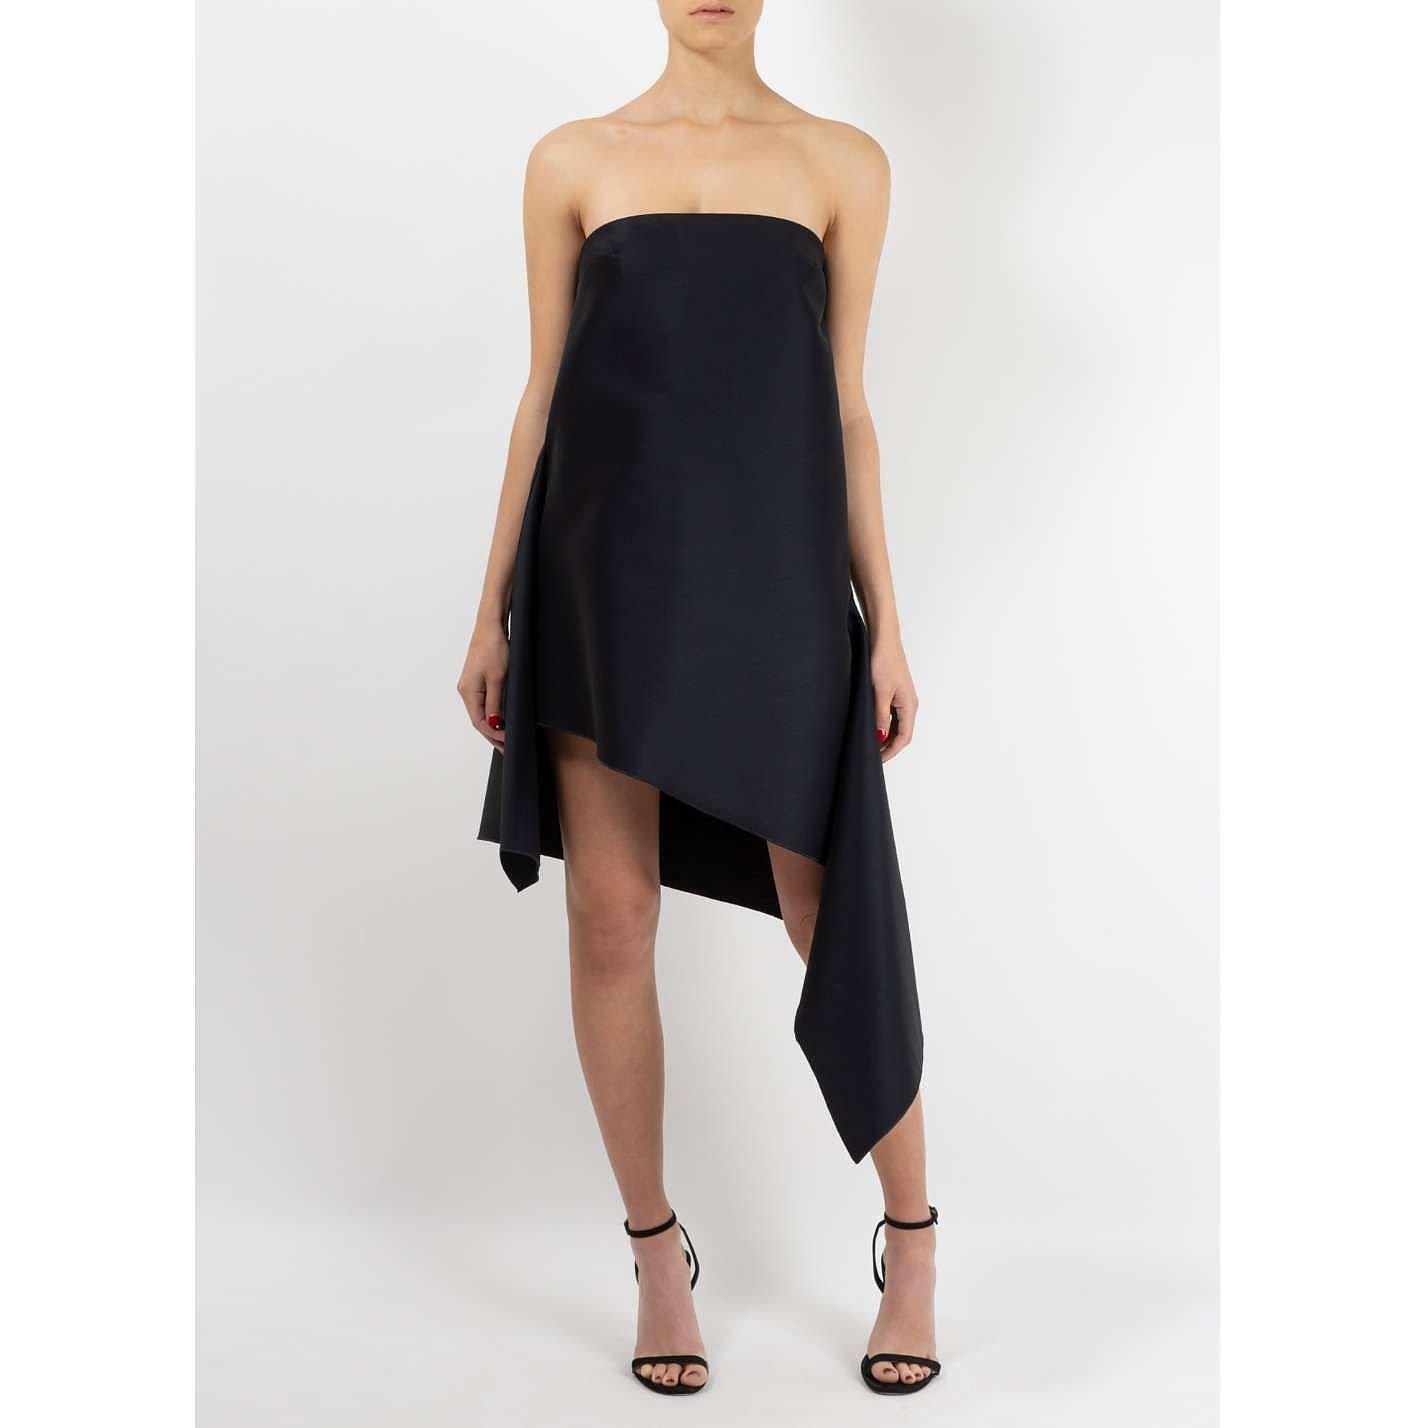 Dion Lee Strapless Asymmetrical Dress